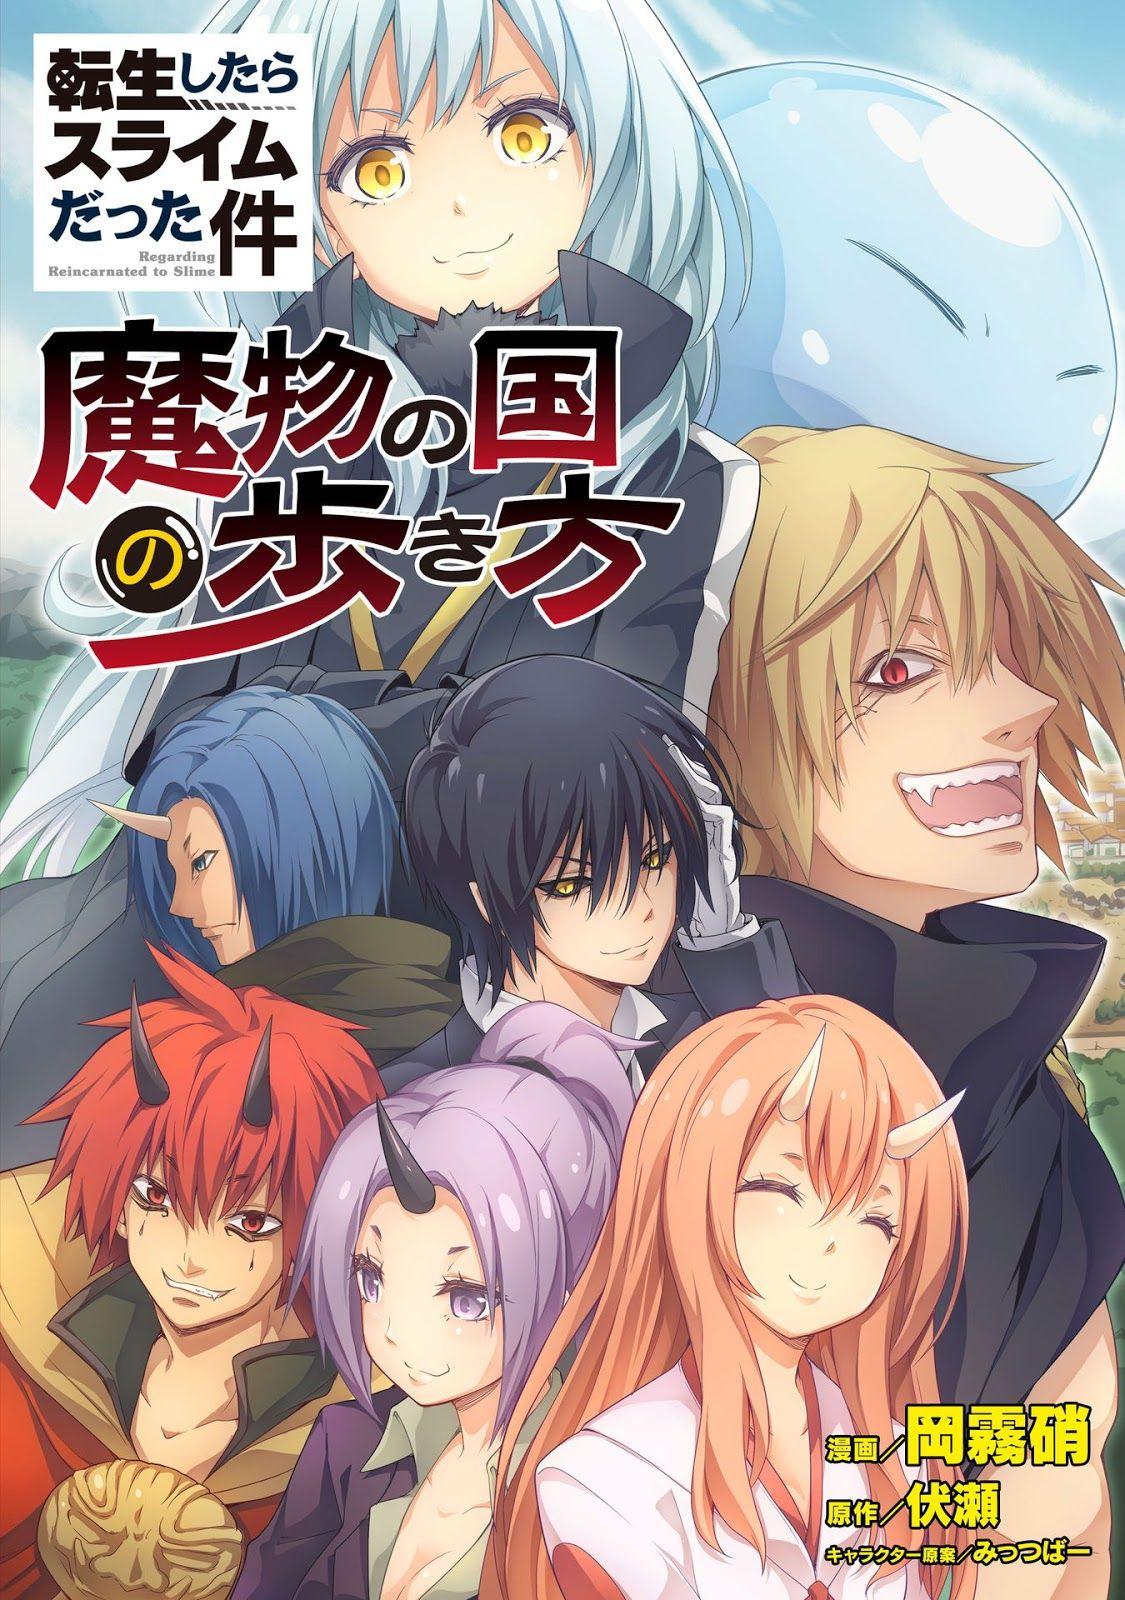 Manga Flash Raw Tensei Shitara Slime Datta Ken Manga